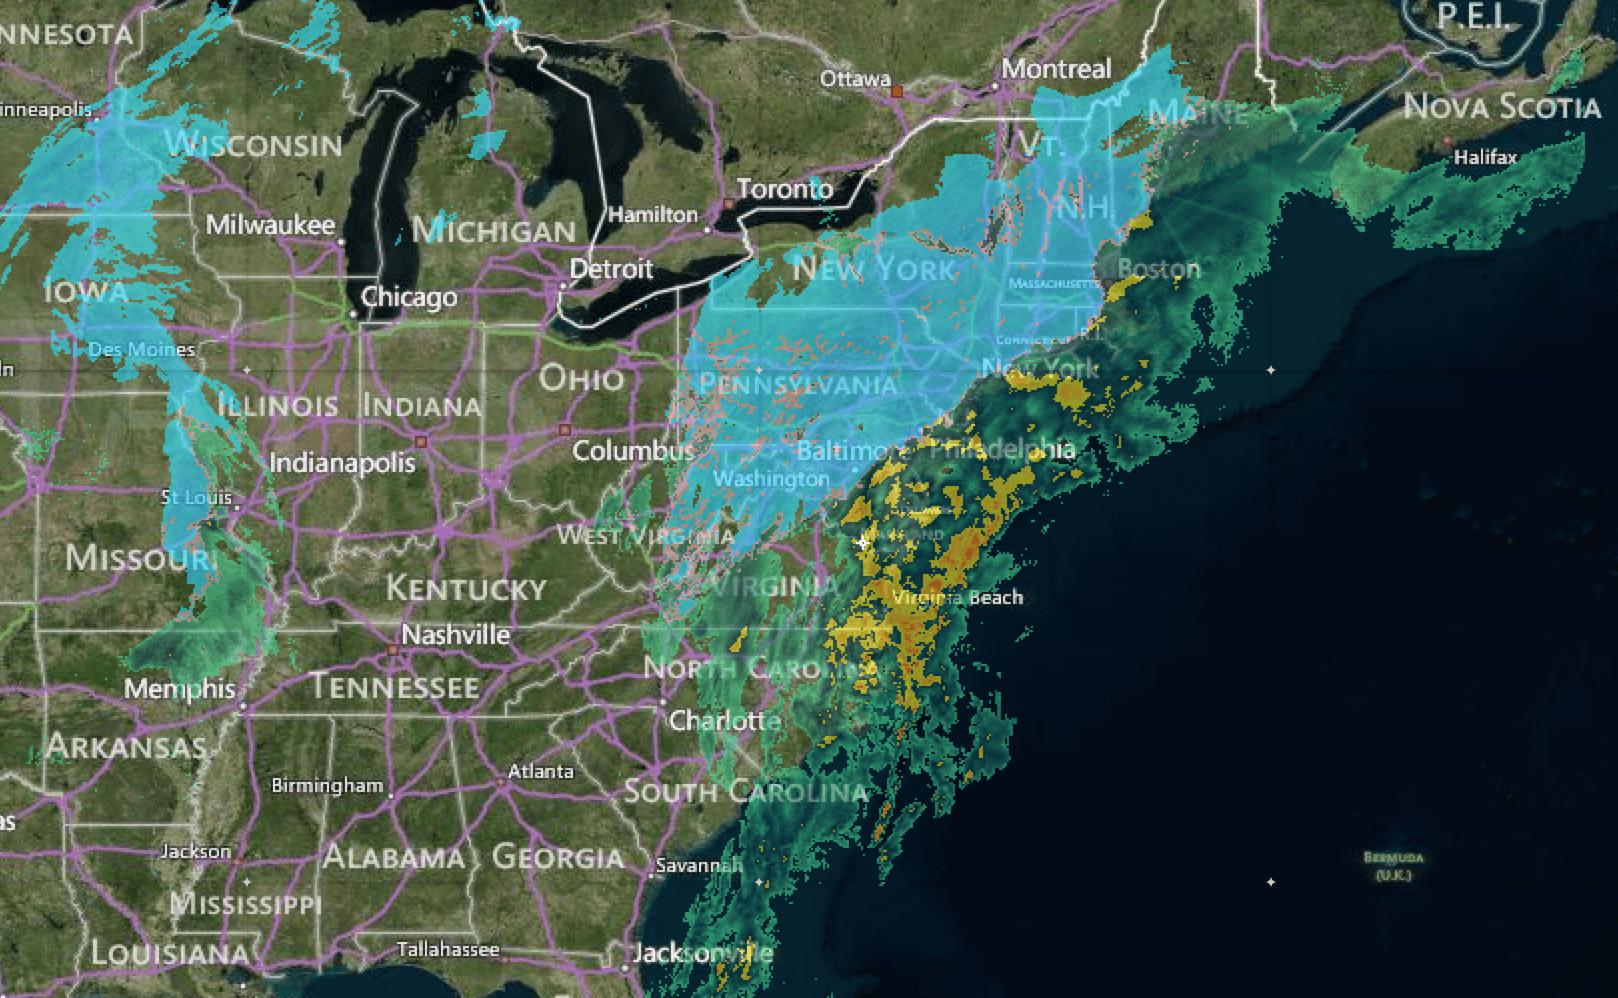 Radar image at 12:20 pm EST, Wednesday November 26, 2014